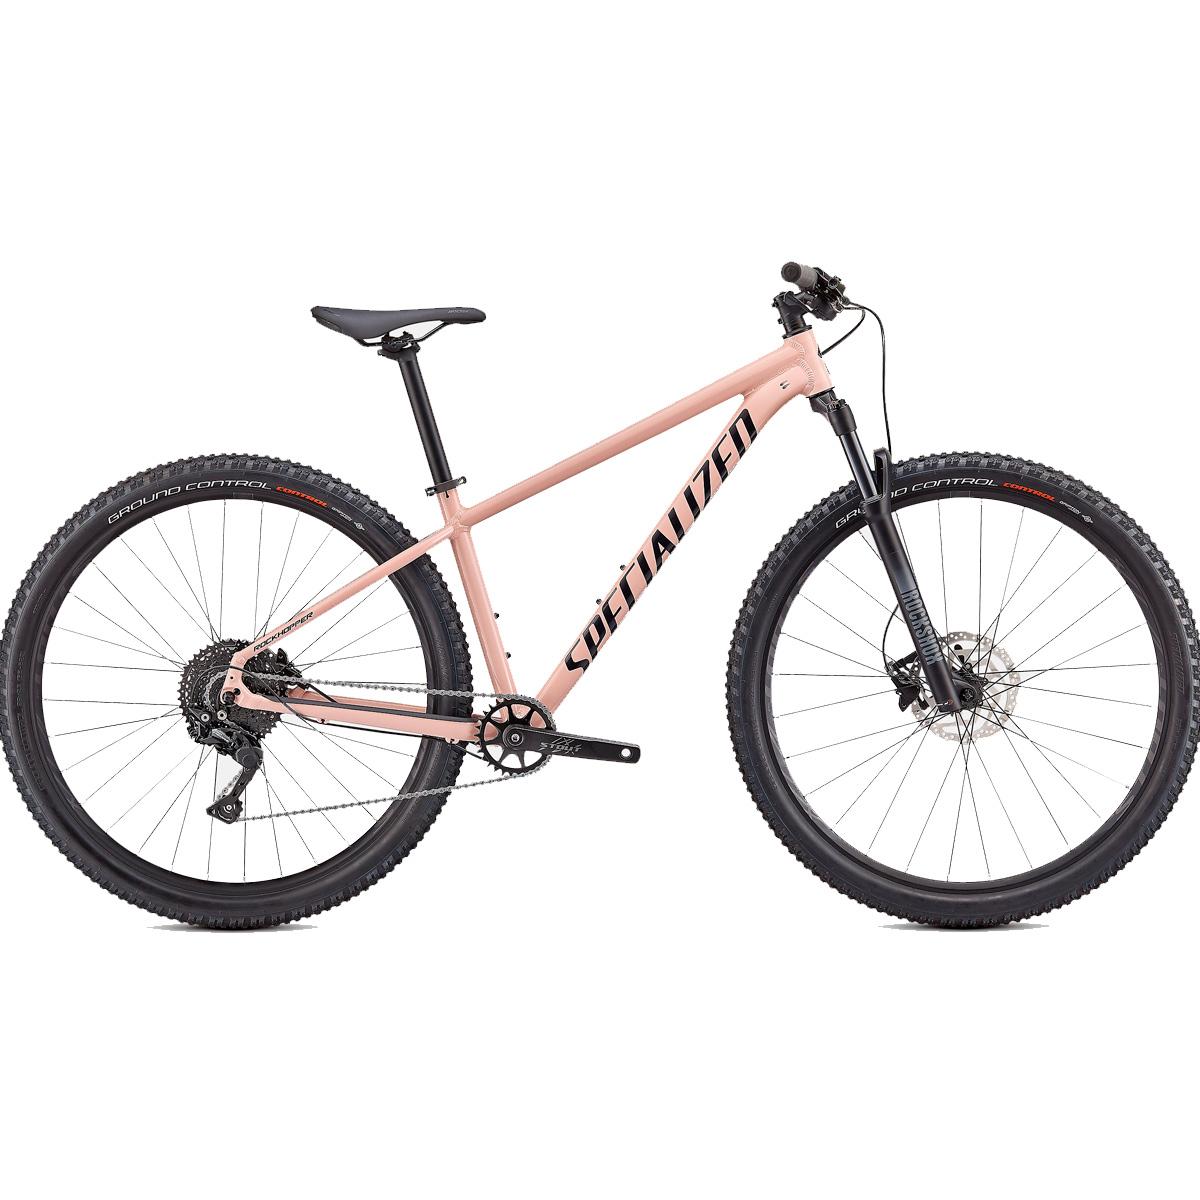 Bicicleta Specialized Rockhopper Elite 29 2021